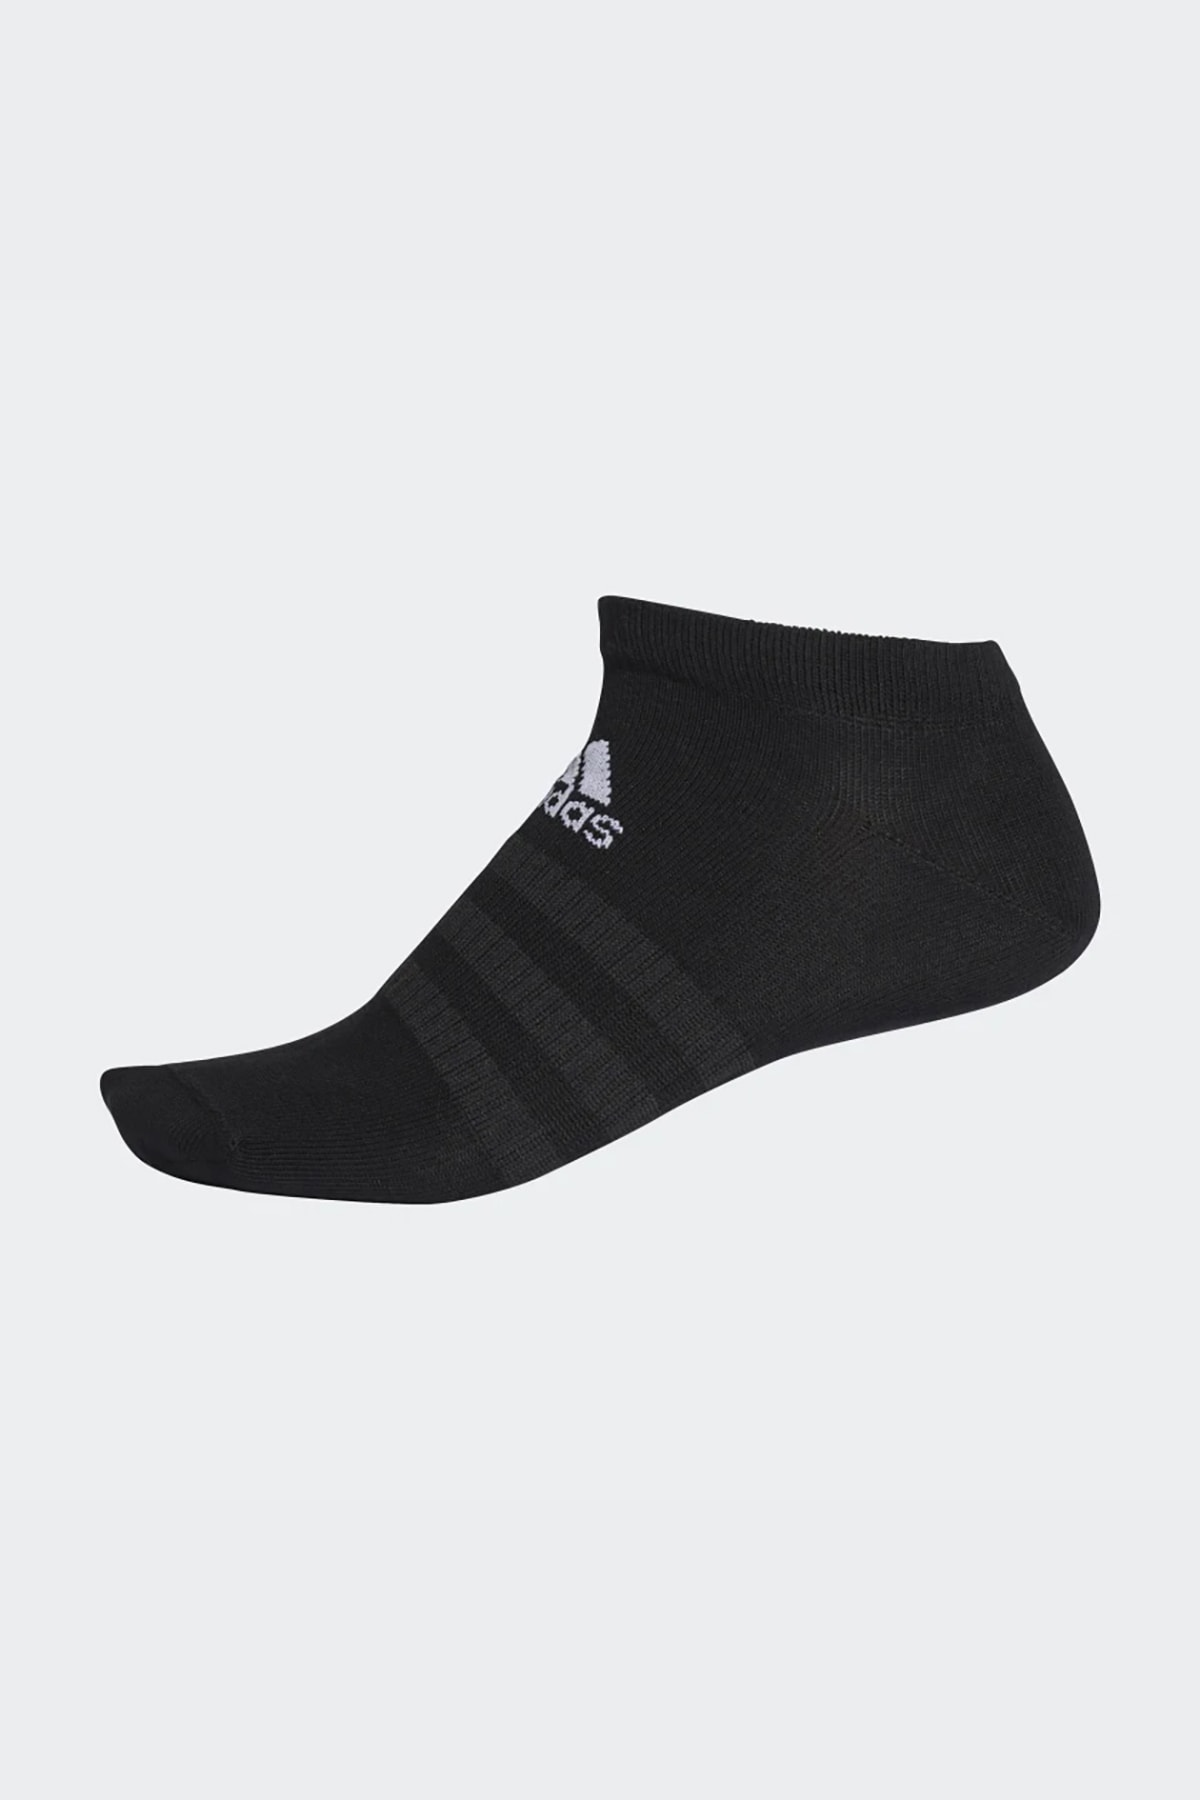 adidas Unısex Günlük Çorap Dz9423 Lıght Low 1Pp